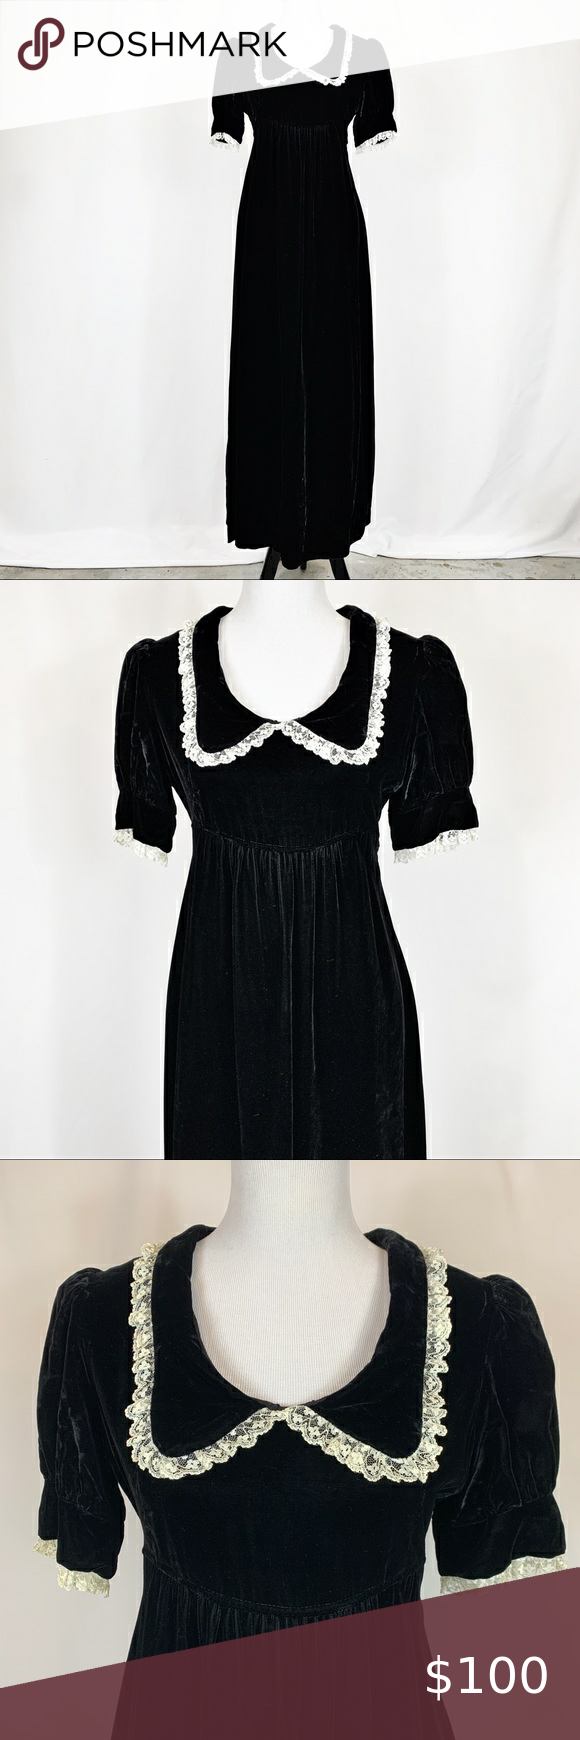 Vintage 70s Black Velvet Empire Maxi Dress L Empire Maxi Dress Maxi Dress Clothes Design [ 1740 x 580 Pixel ]